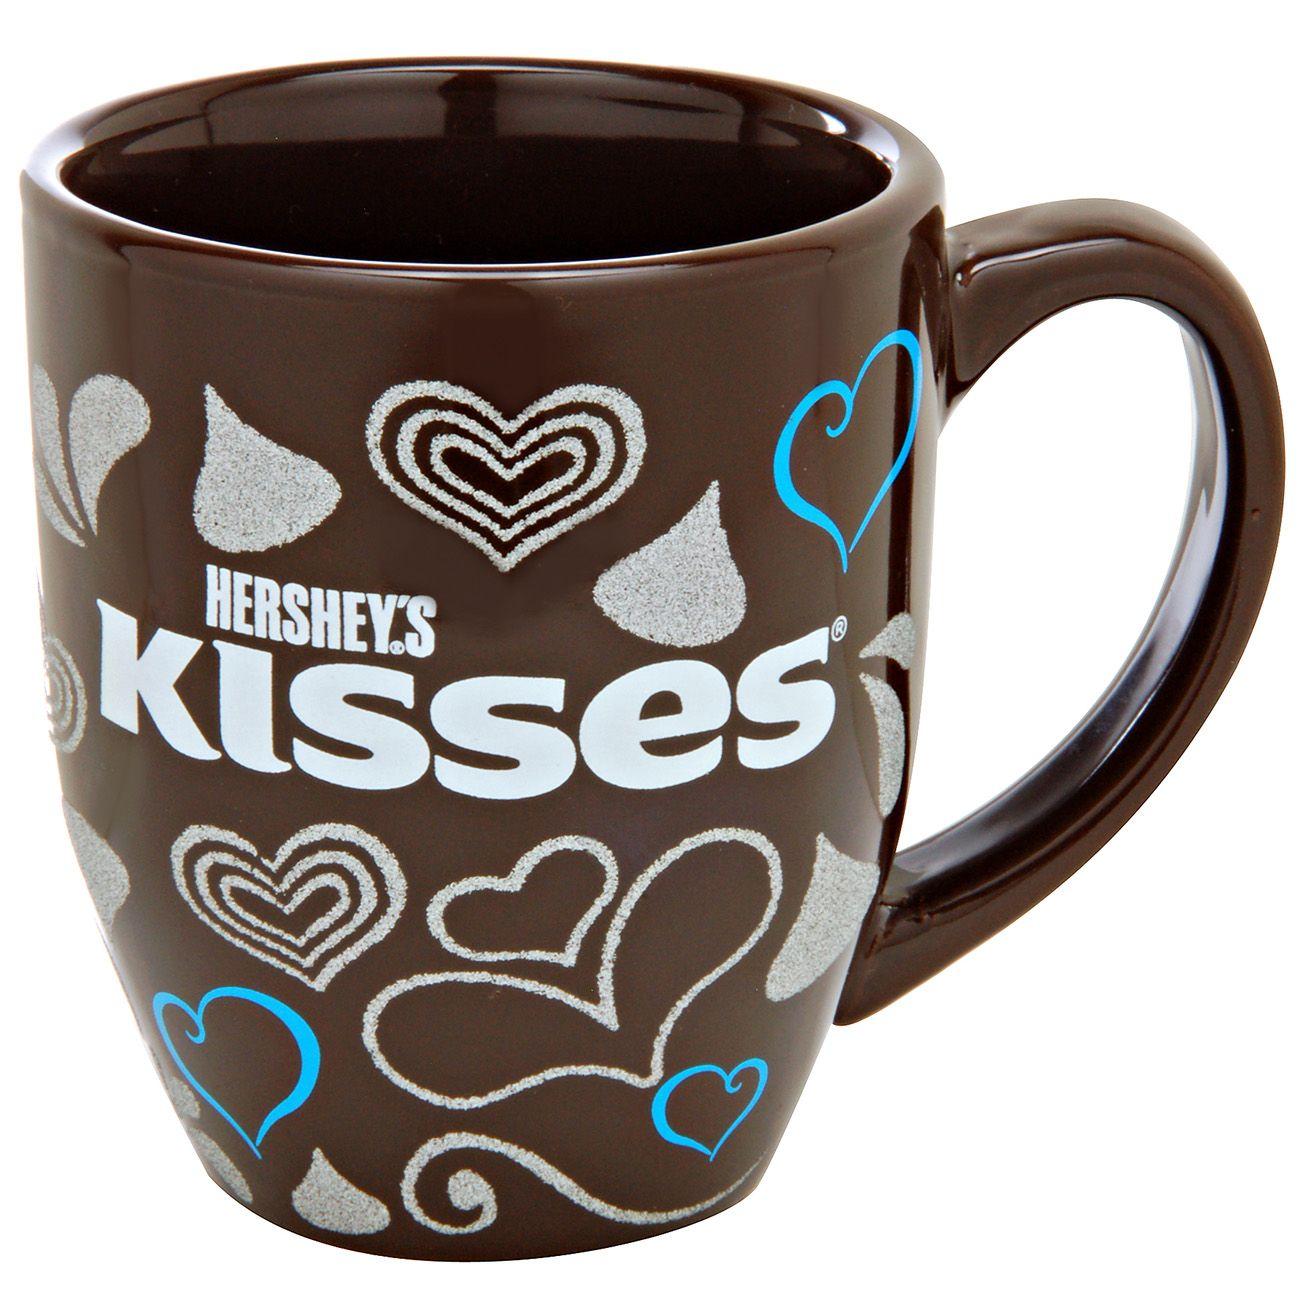 Hersheys kisses glitter hearts mug this rich chocolate